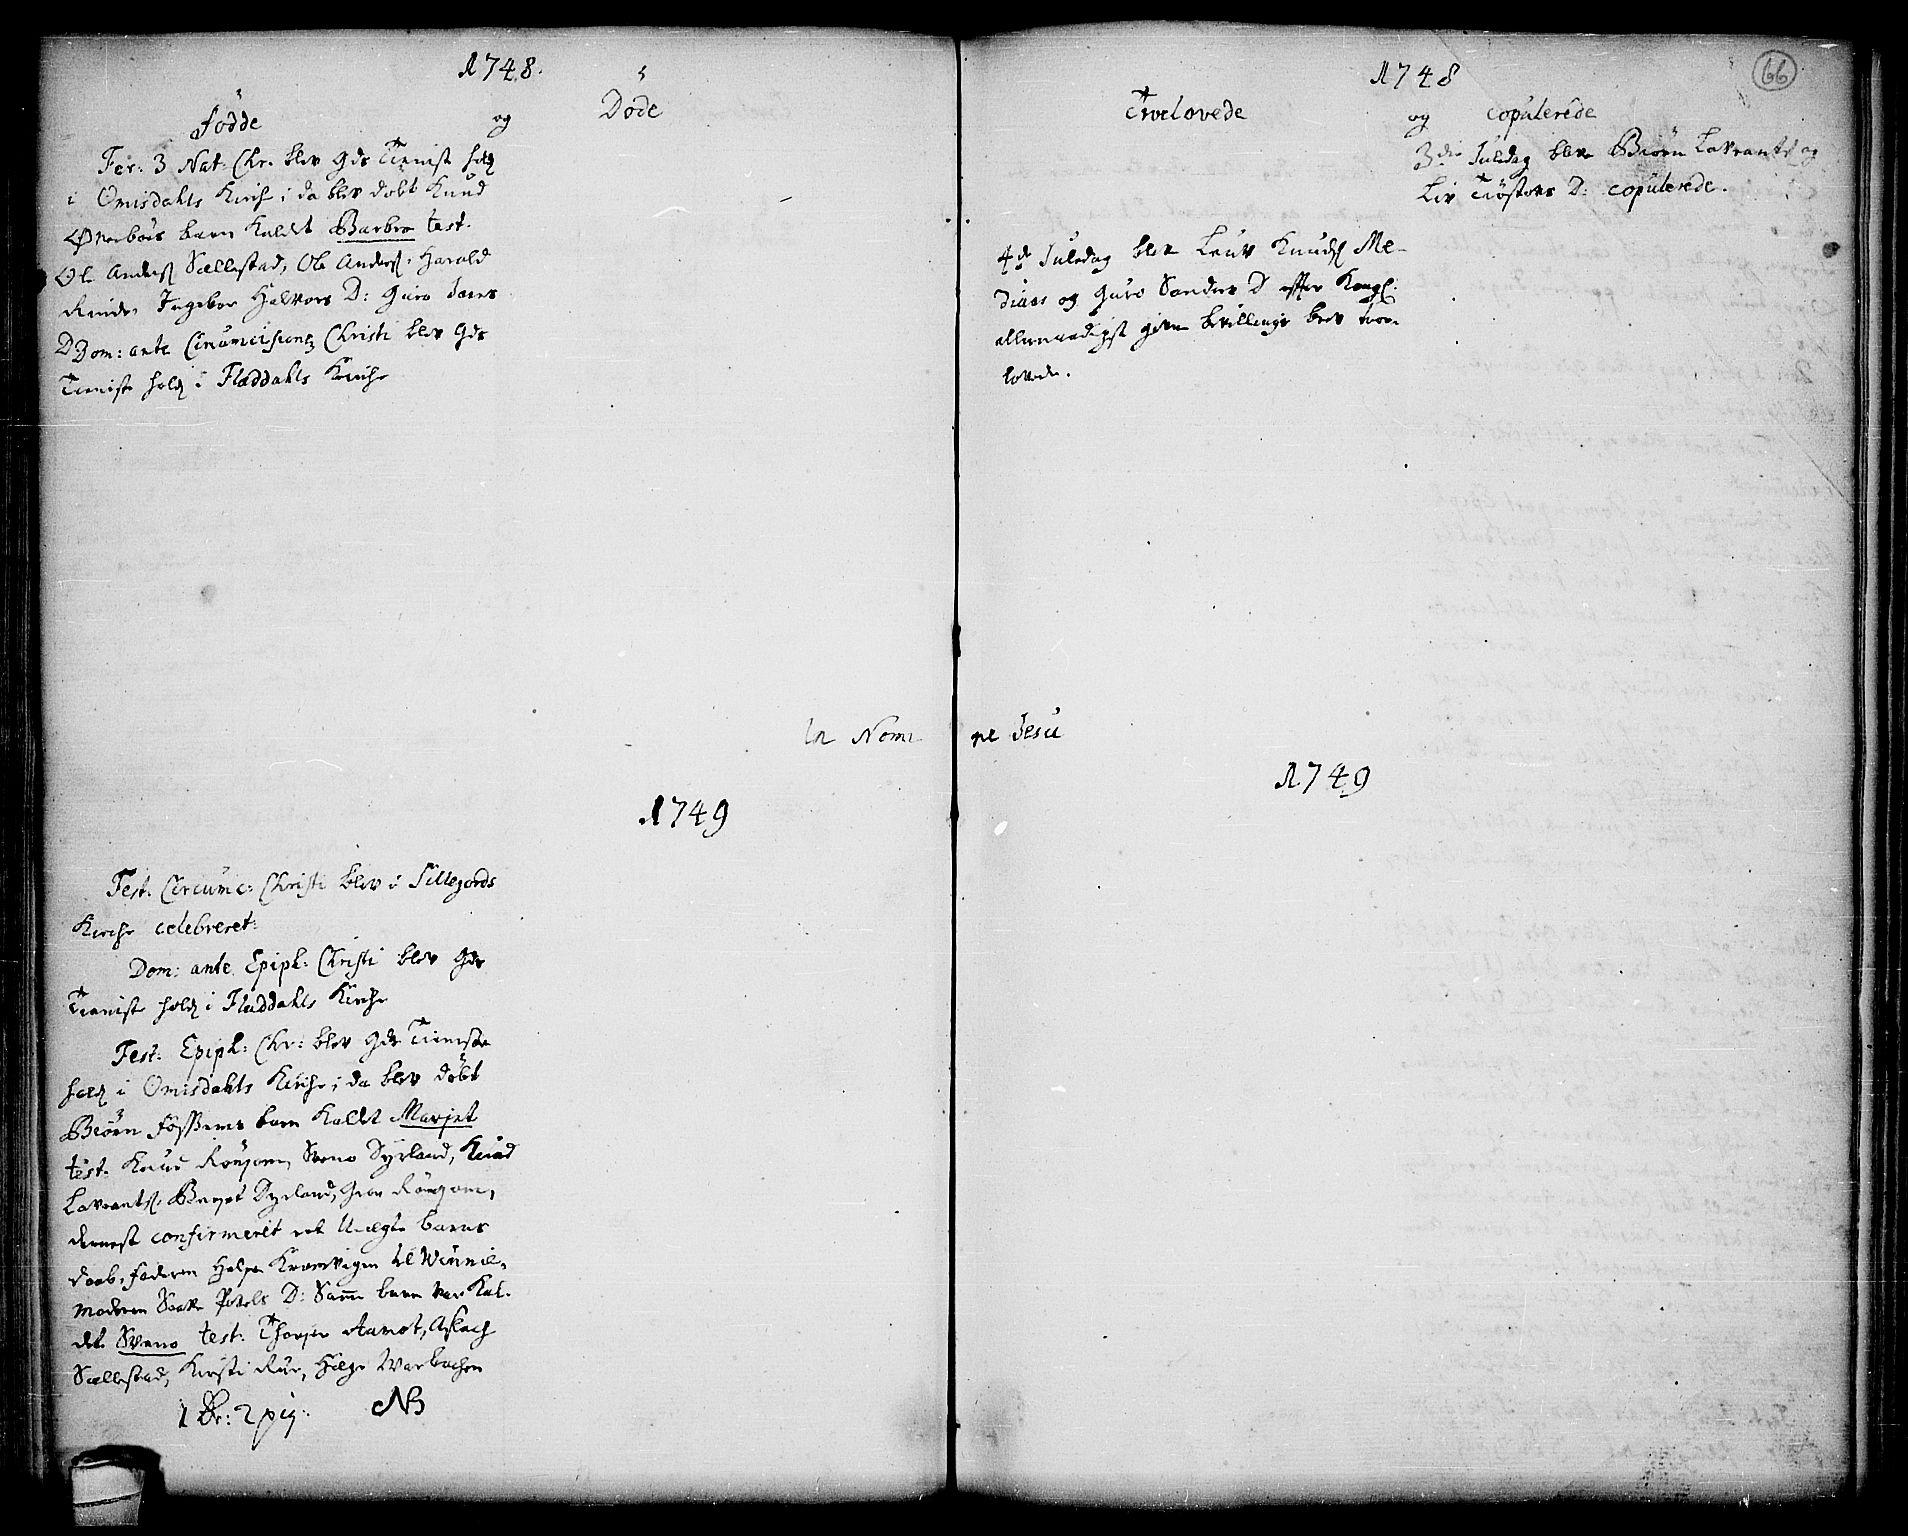 SAKO, Seljord kirkebøker, F/Fa/L0006: Parish register (official) no. I 6, 1744-1755, p. 66